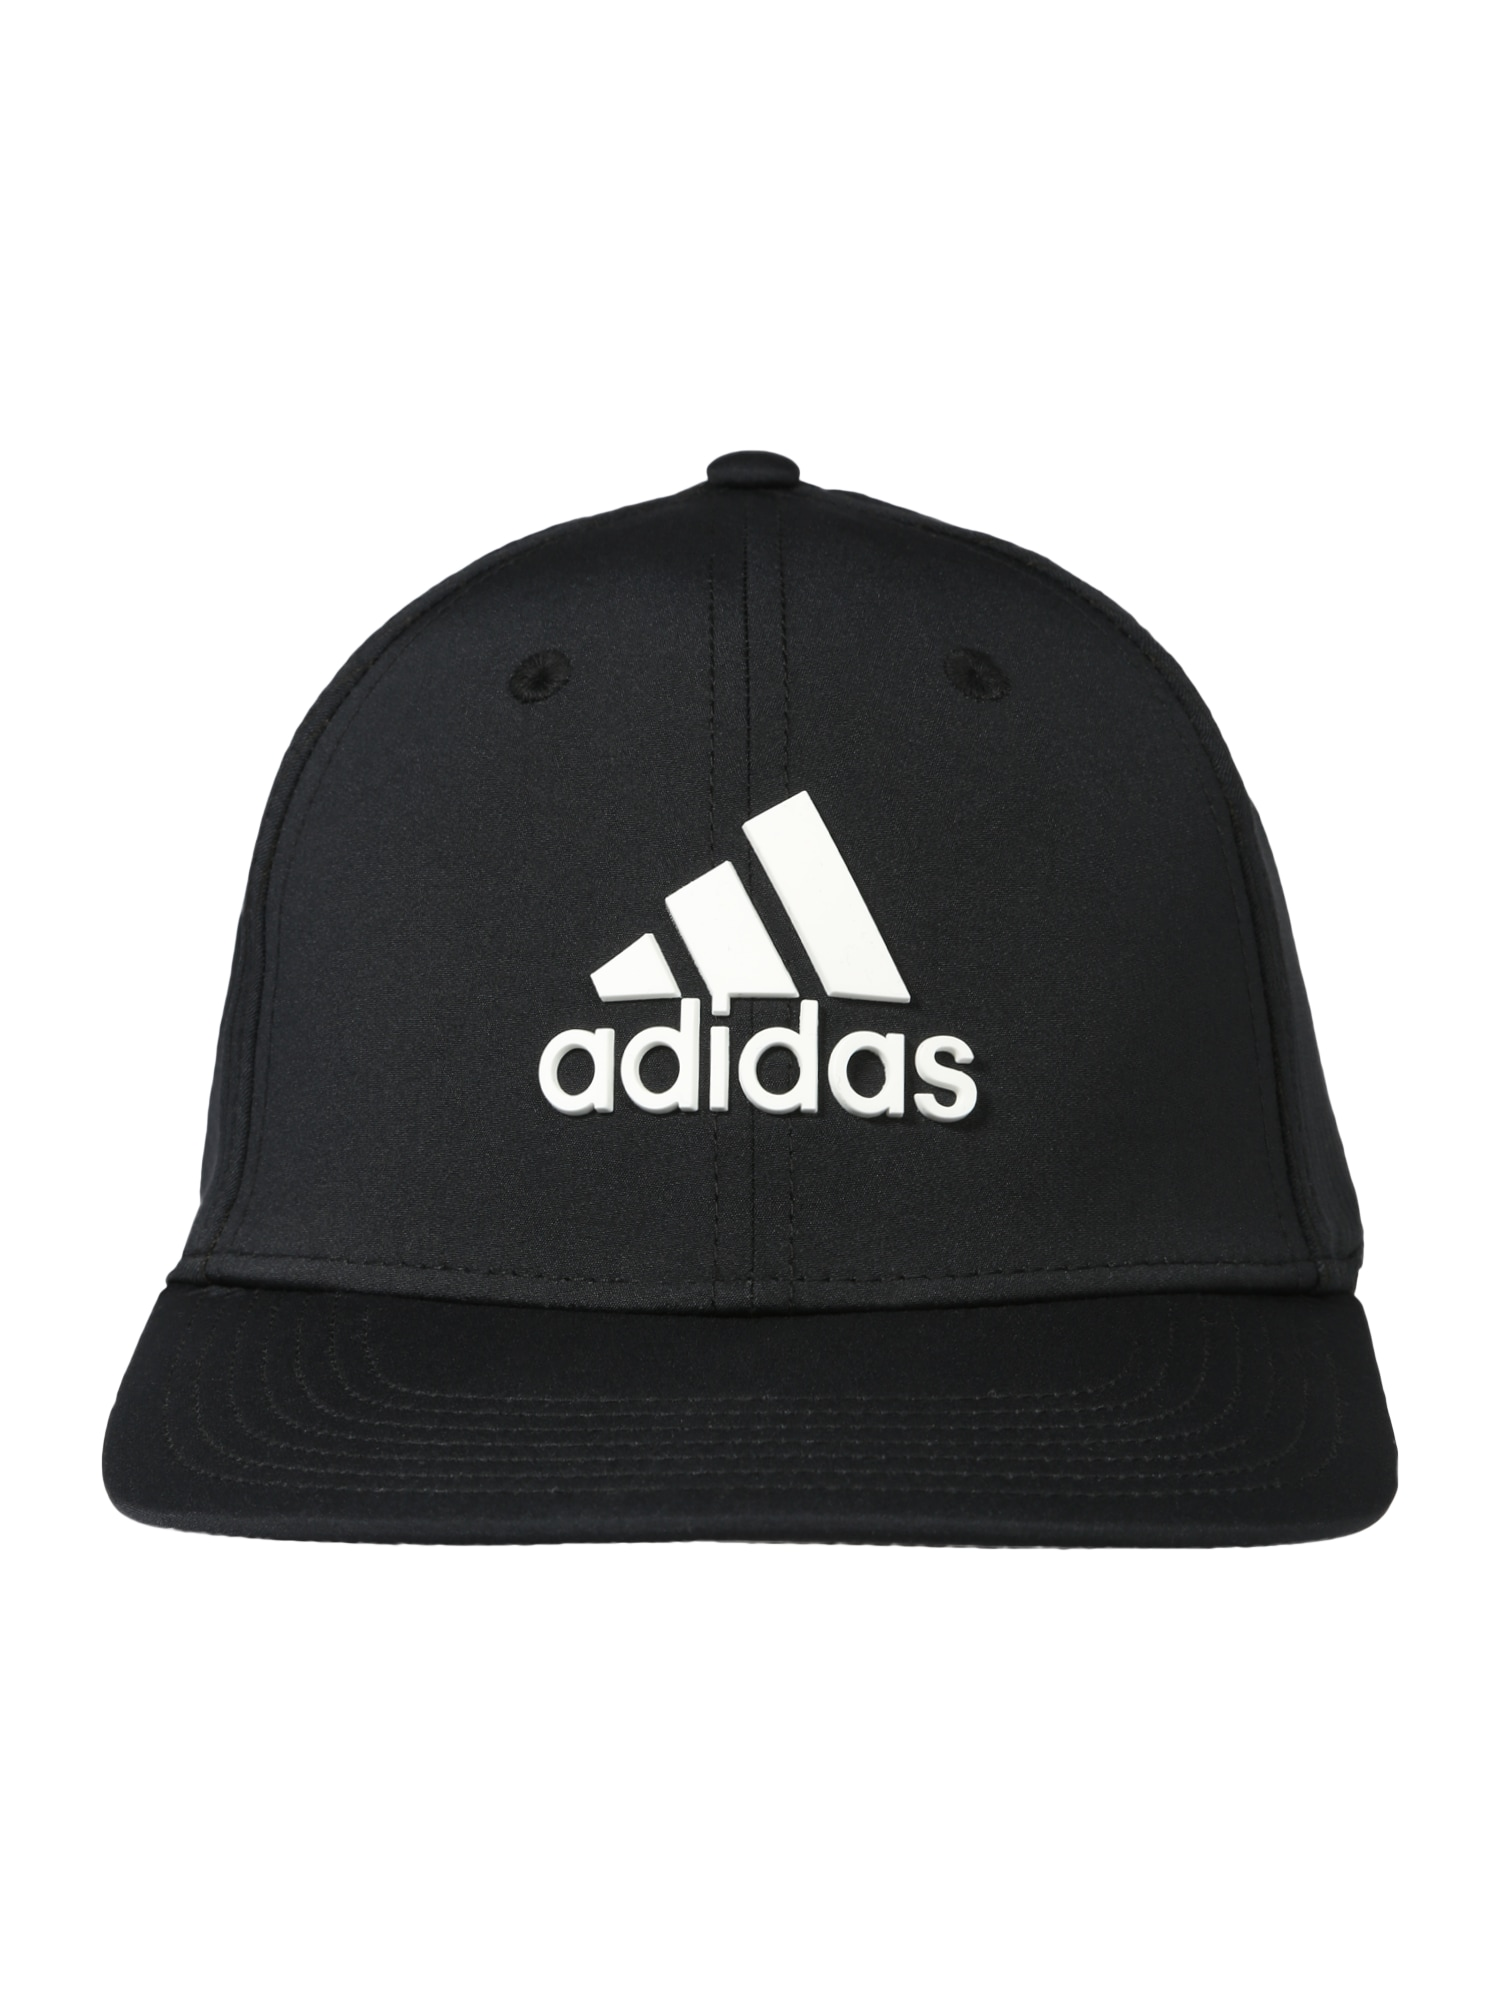 adidas Golf Sportovní kšiltovka 'Tour'  bílá / černá